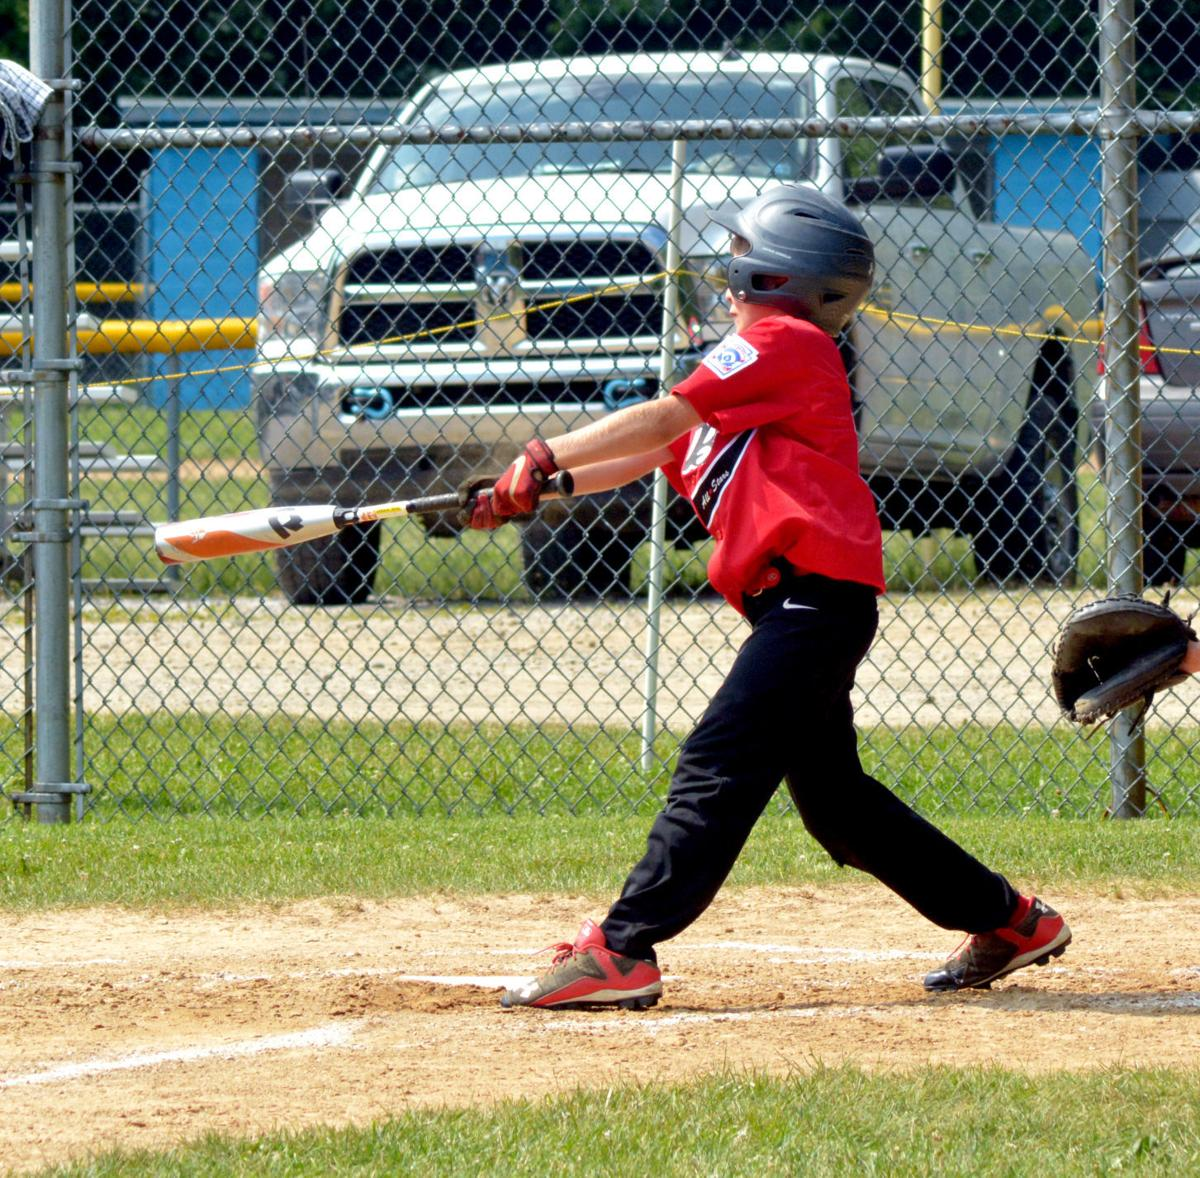 DUB MLBB Wilmoth hitting